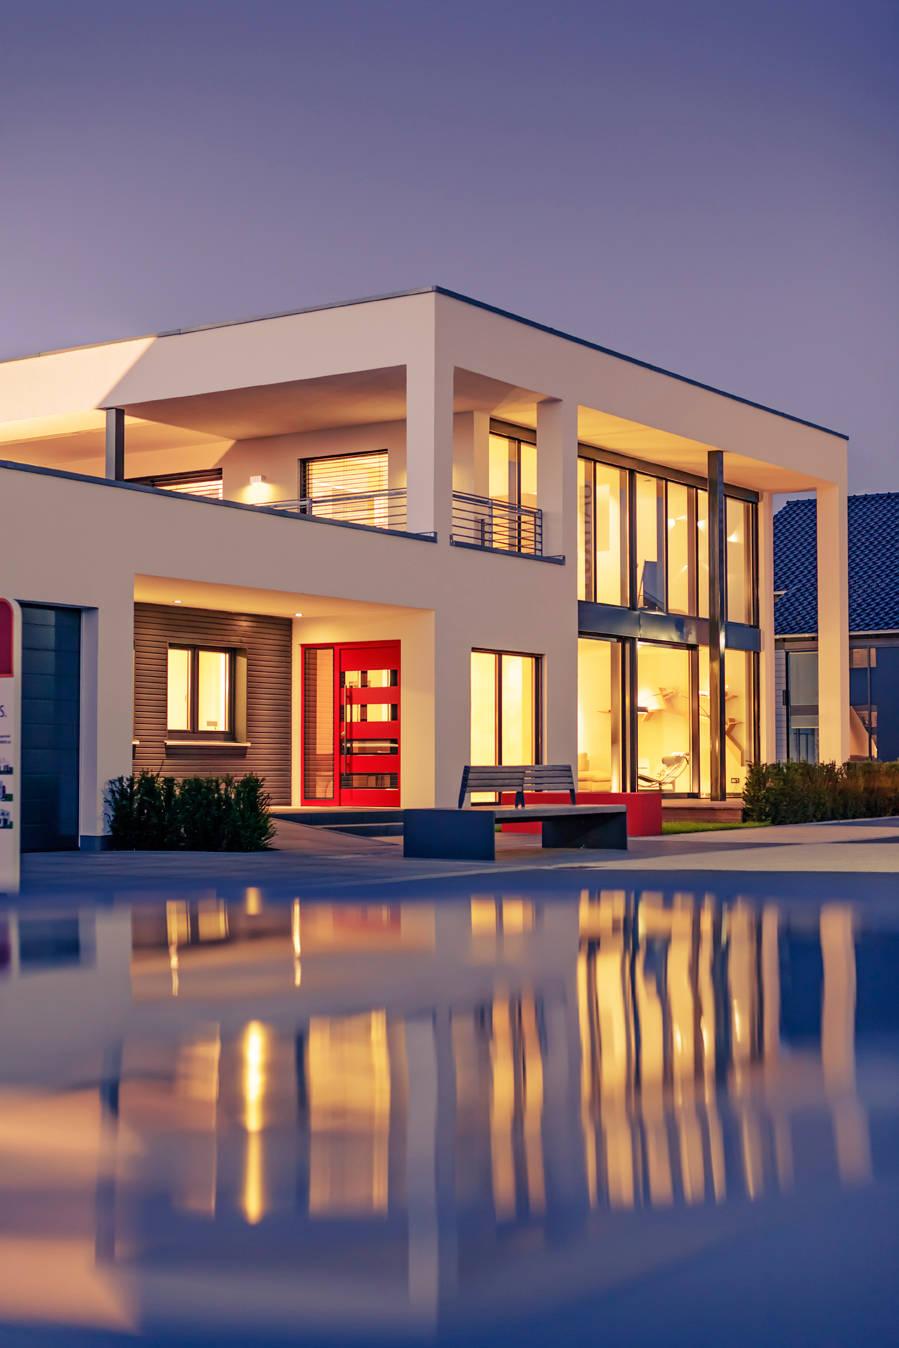 luxhaus musterhaus k ln by lopez fotodesign homify. Black Bedroom Furniture Sets. Home Design Ideas